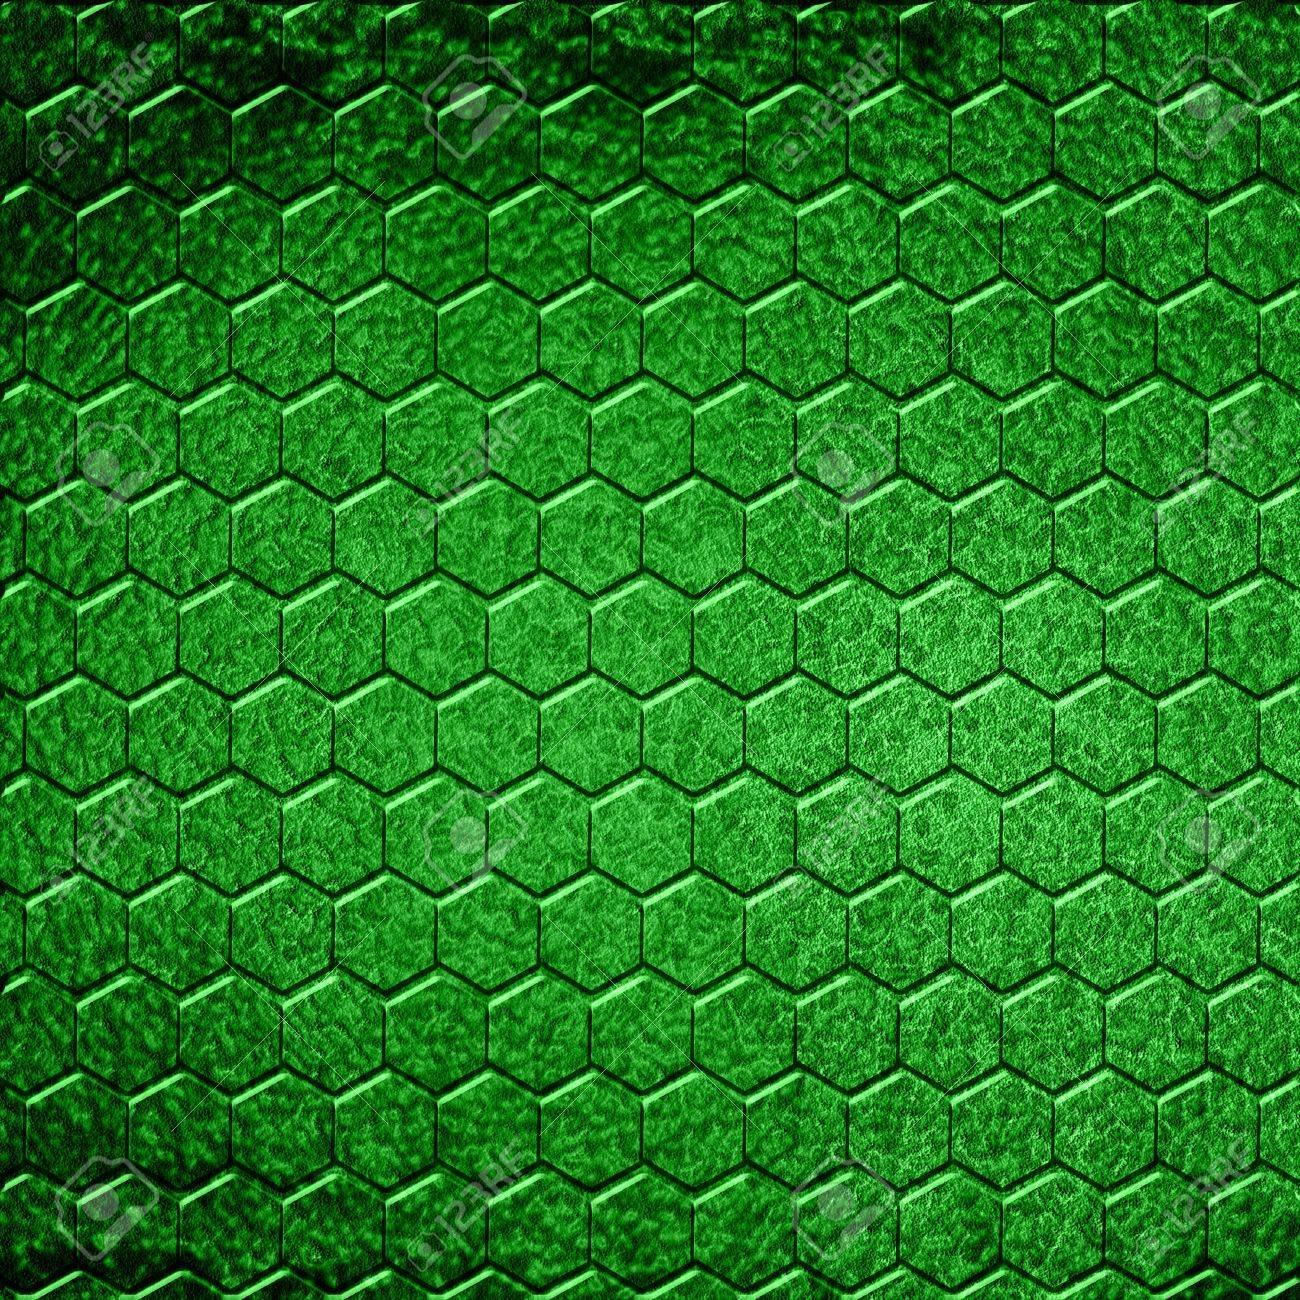 green reptile skin, like lizard skin Stock Photo - 3207478